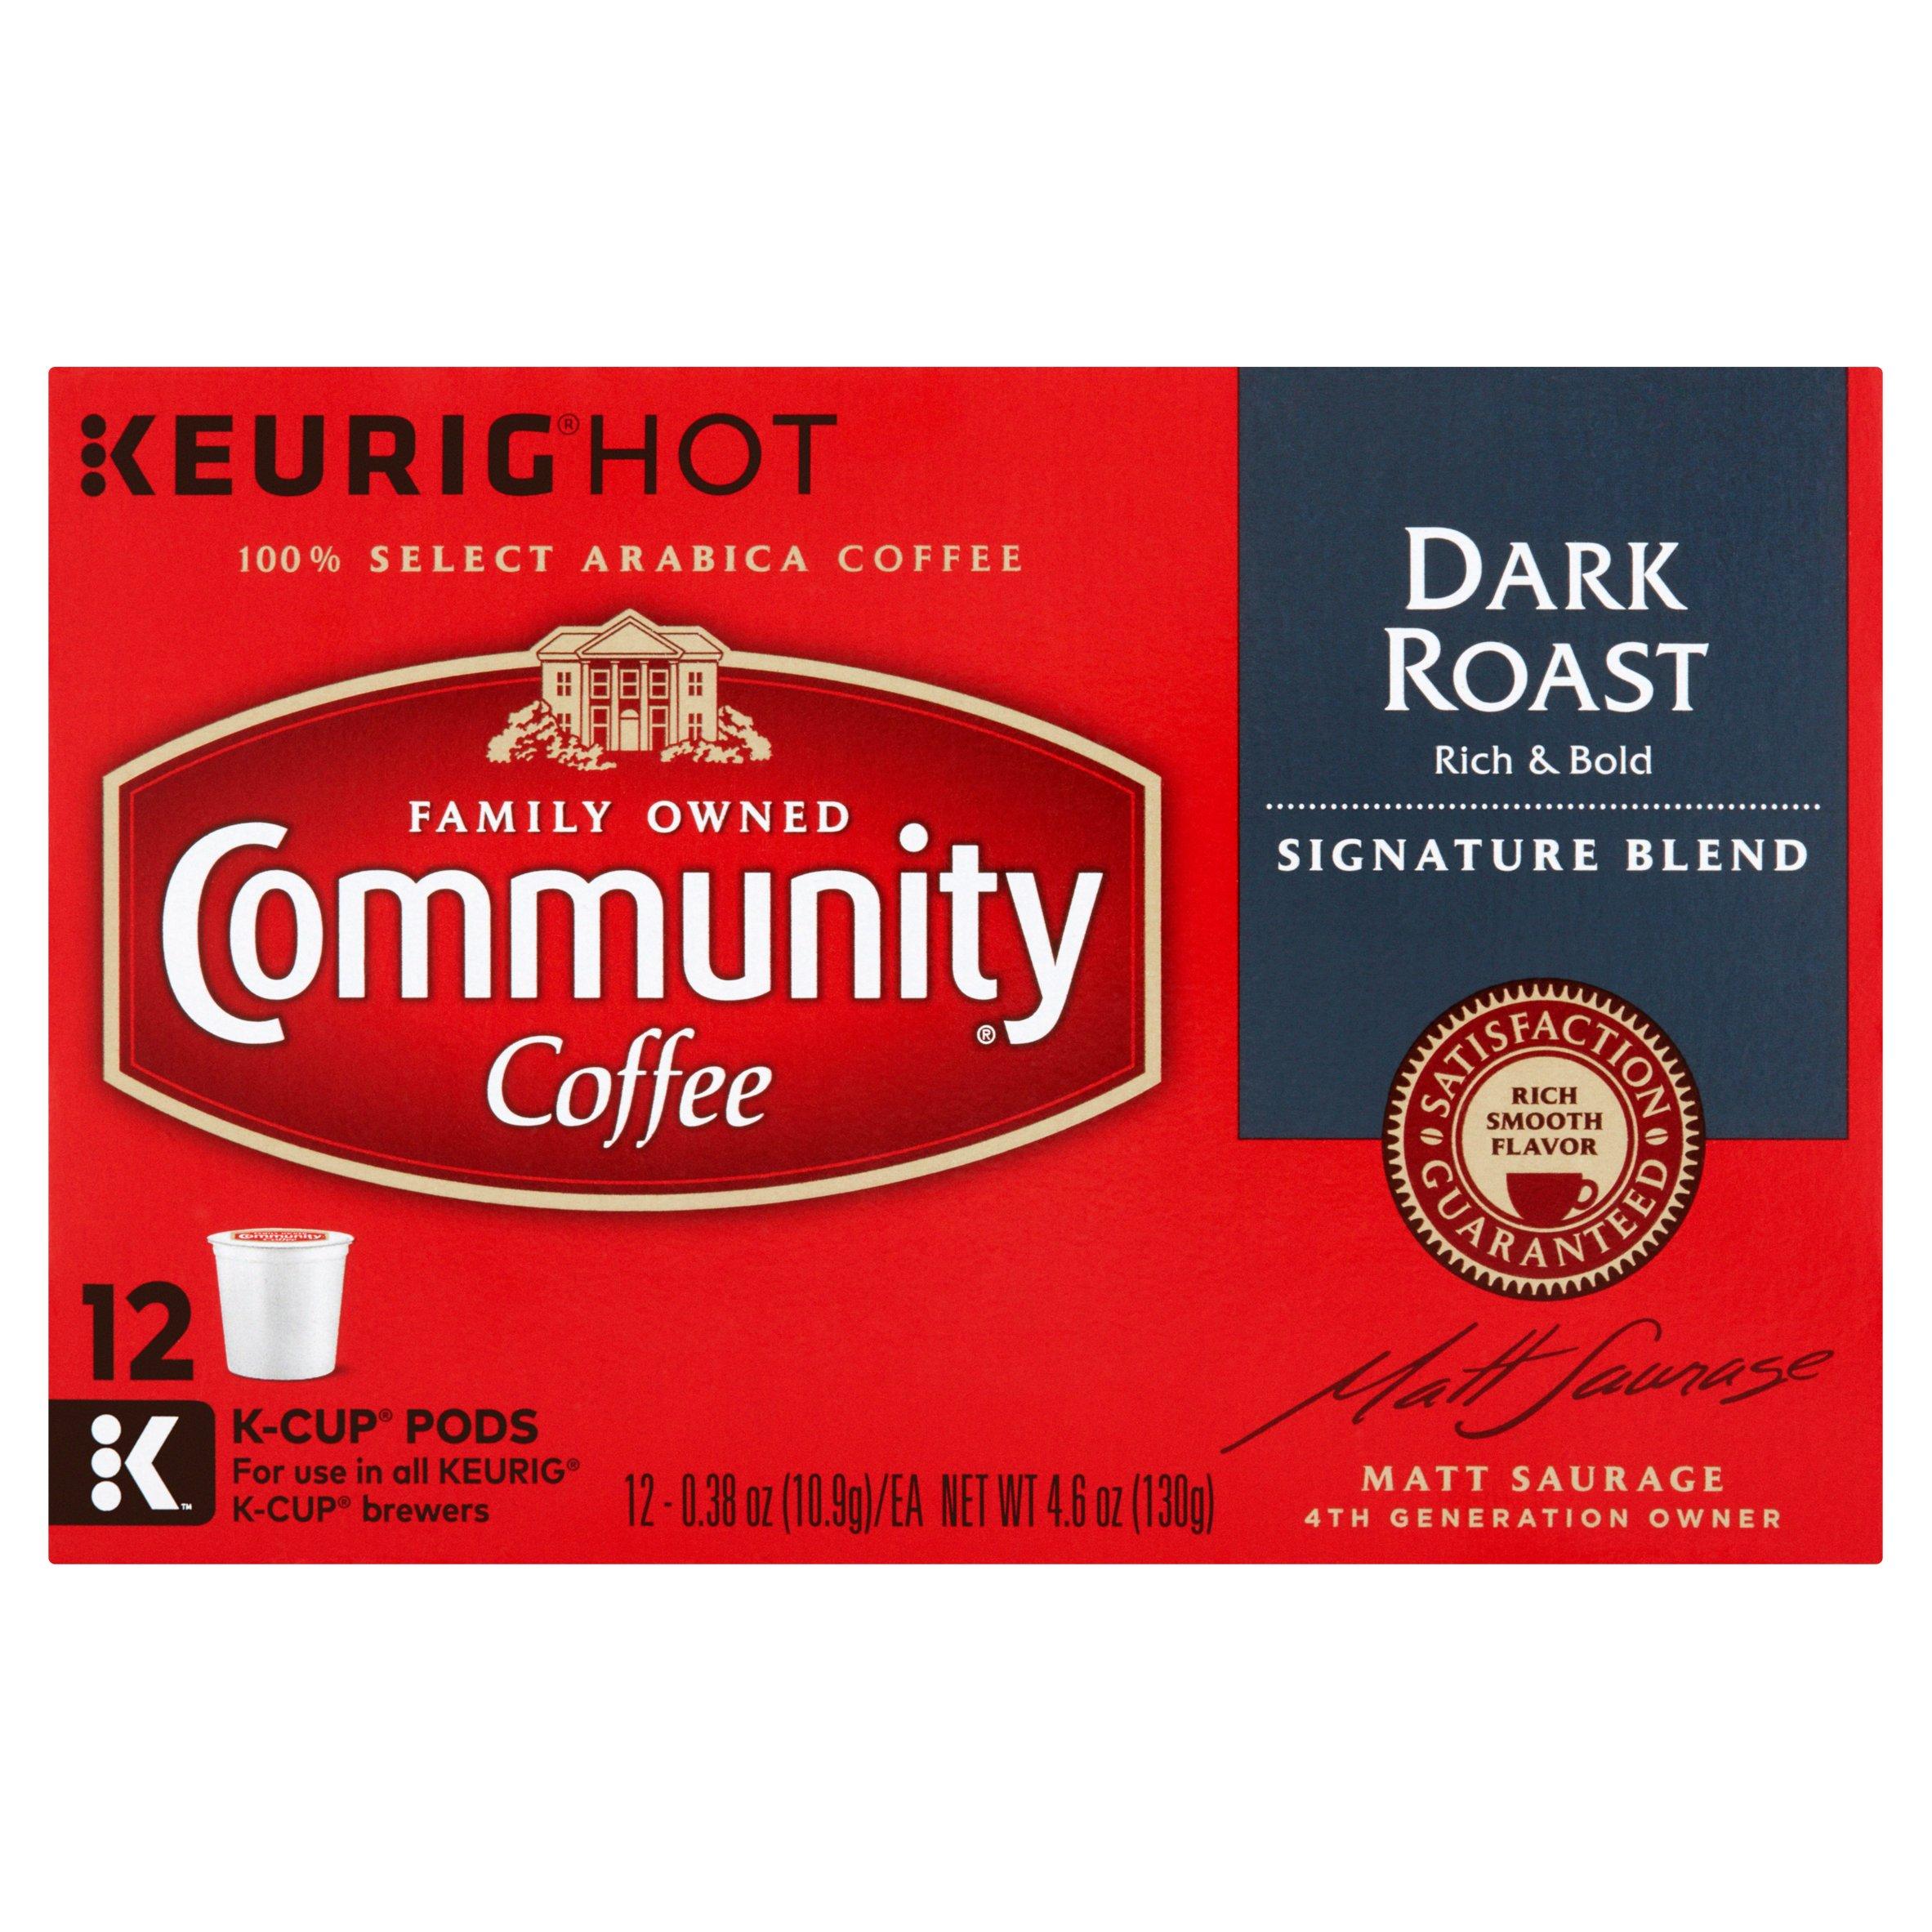 Community Coffee Single-Serve Cups Signature Blend Dark Roast Coffee, 12 Count